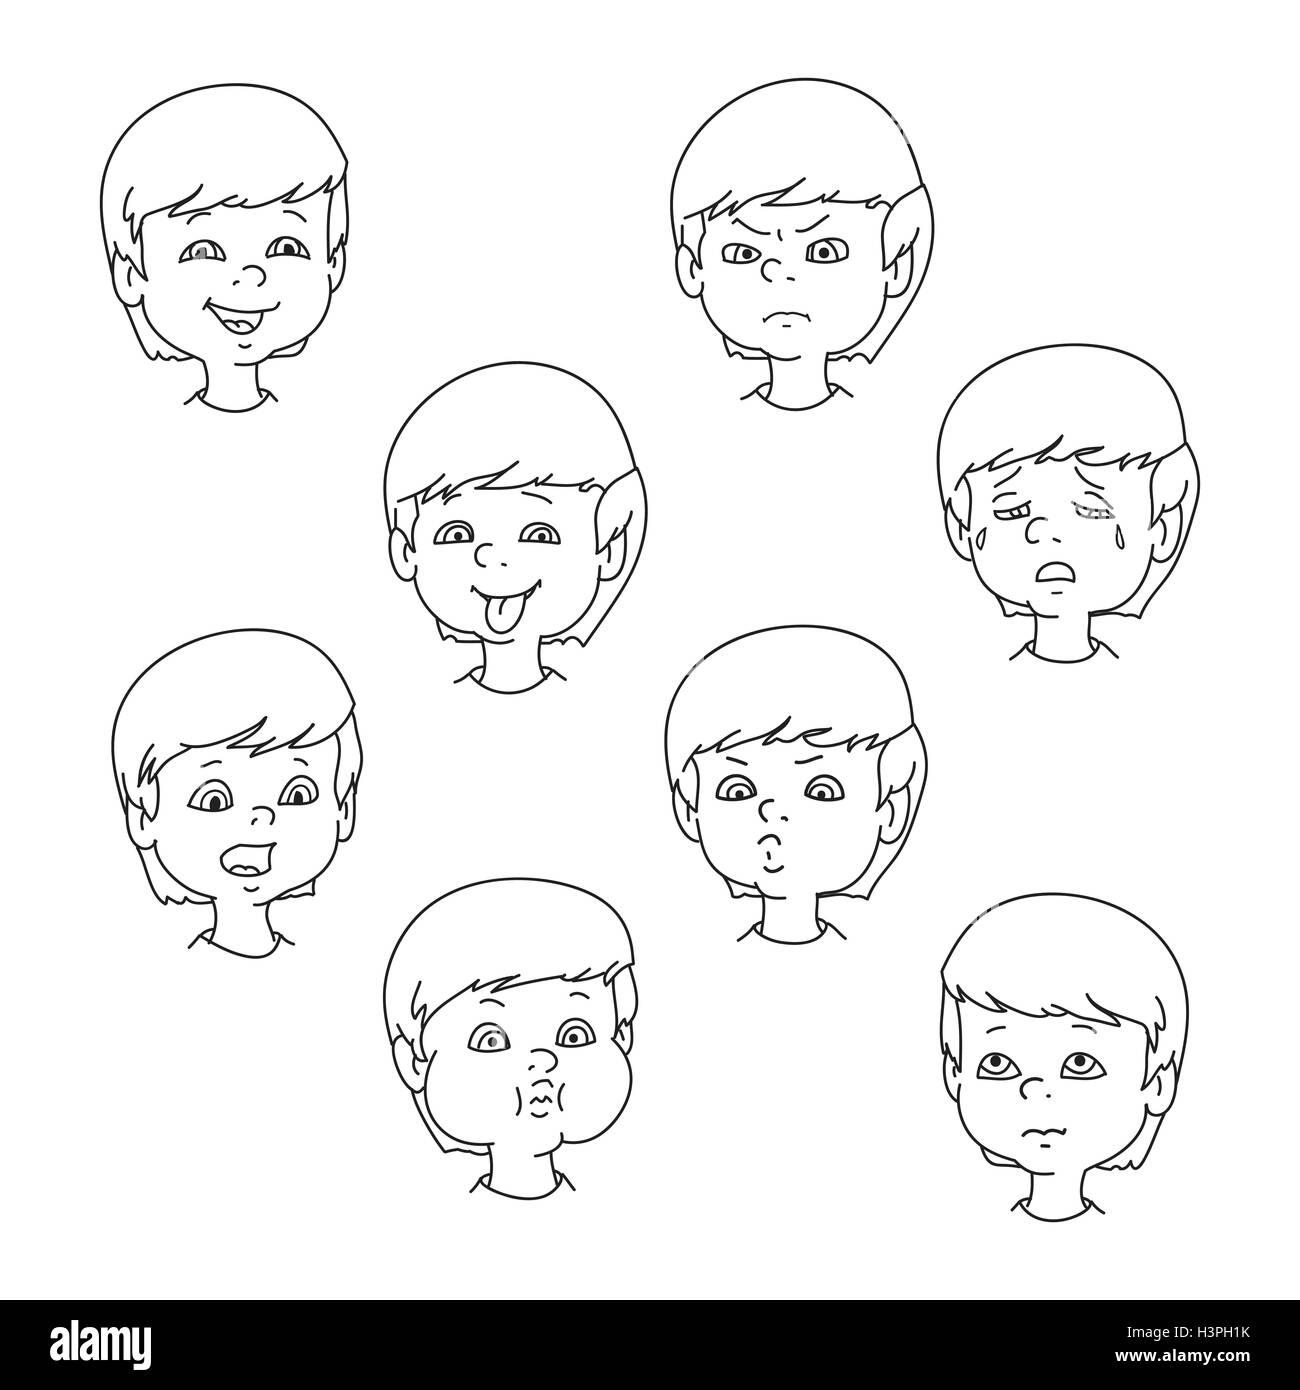 Child Face Emotion Gestures Black And White Vector Illustration